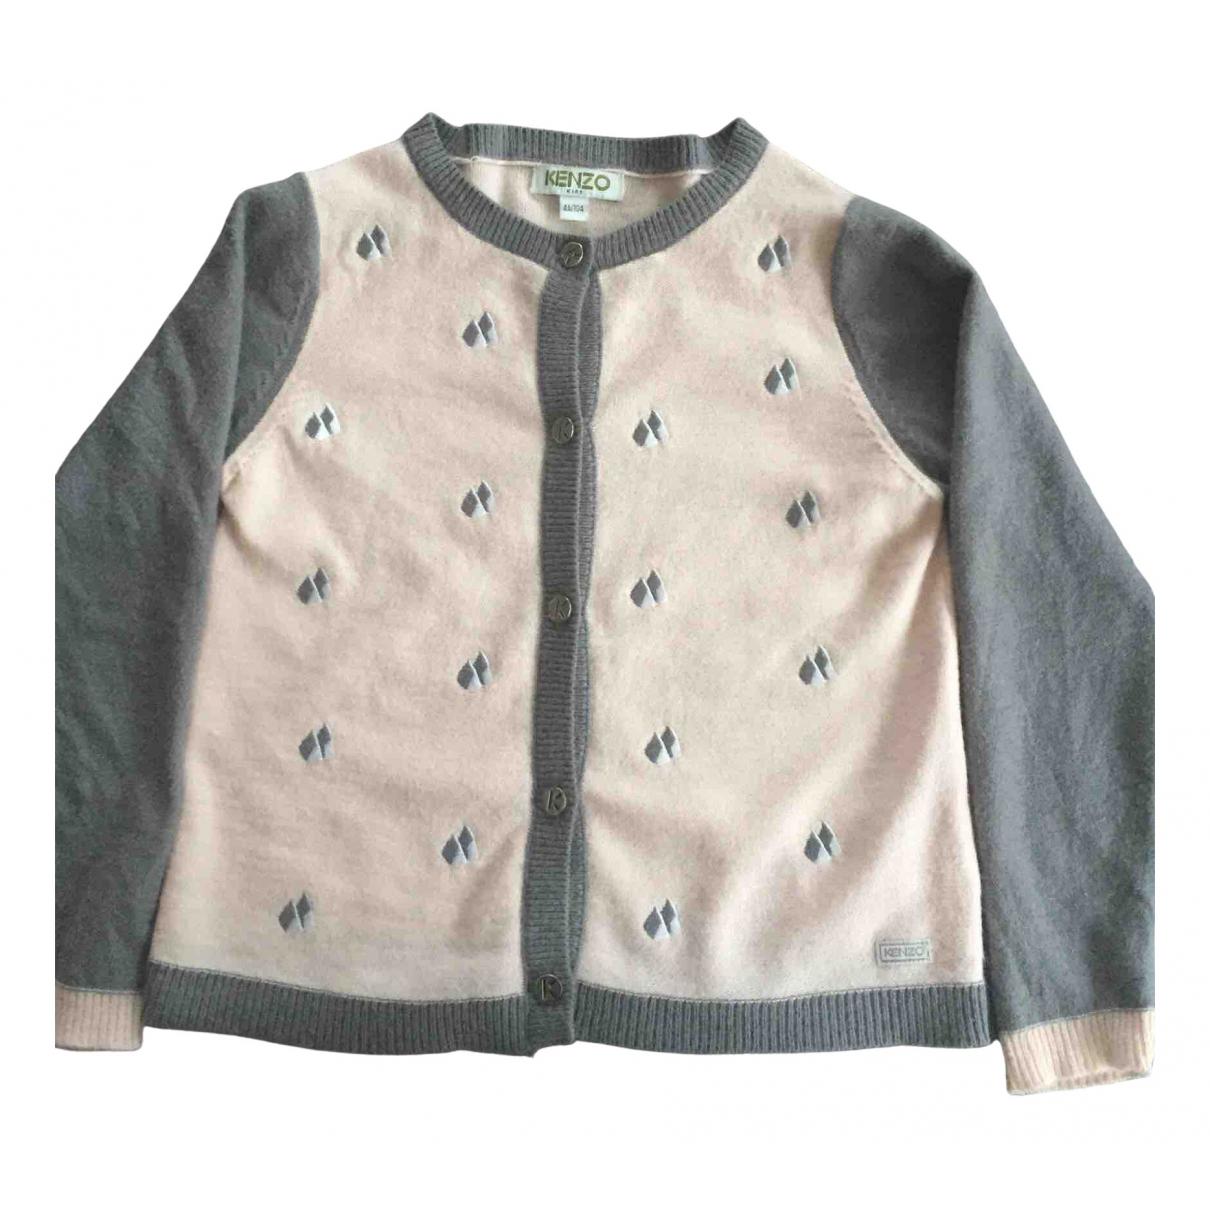 Kenzo - Pull   pour enfant - rose